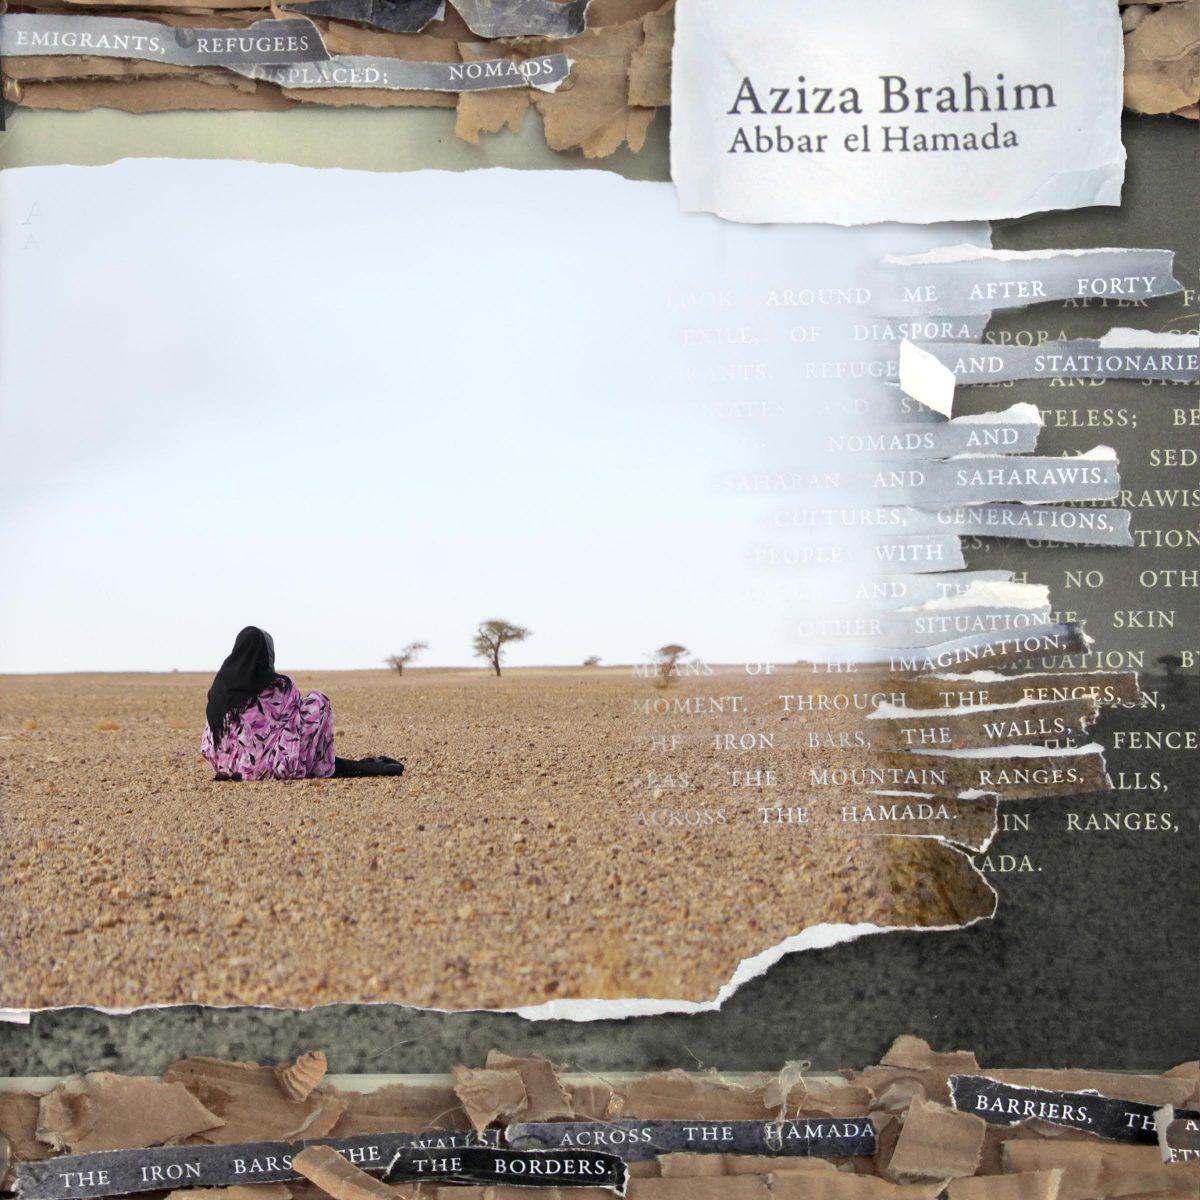 Brahim, Aziza: Abbar El Hamada (2016)